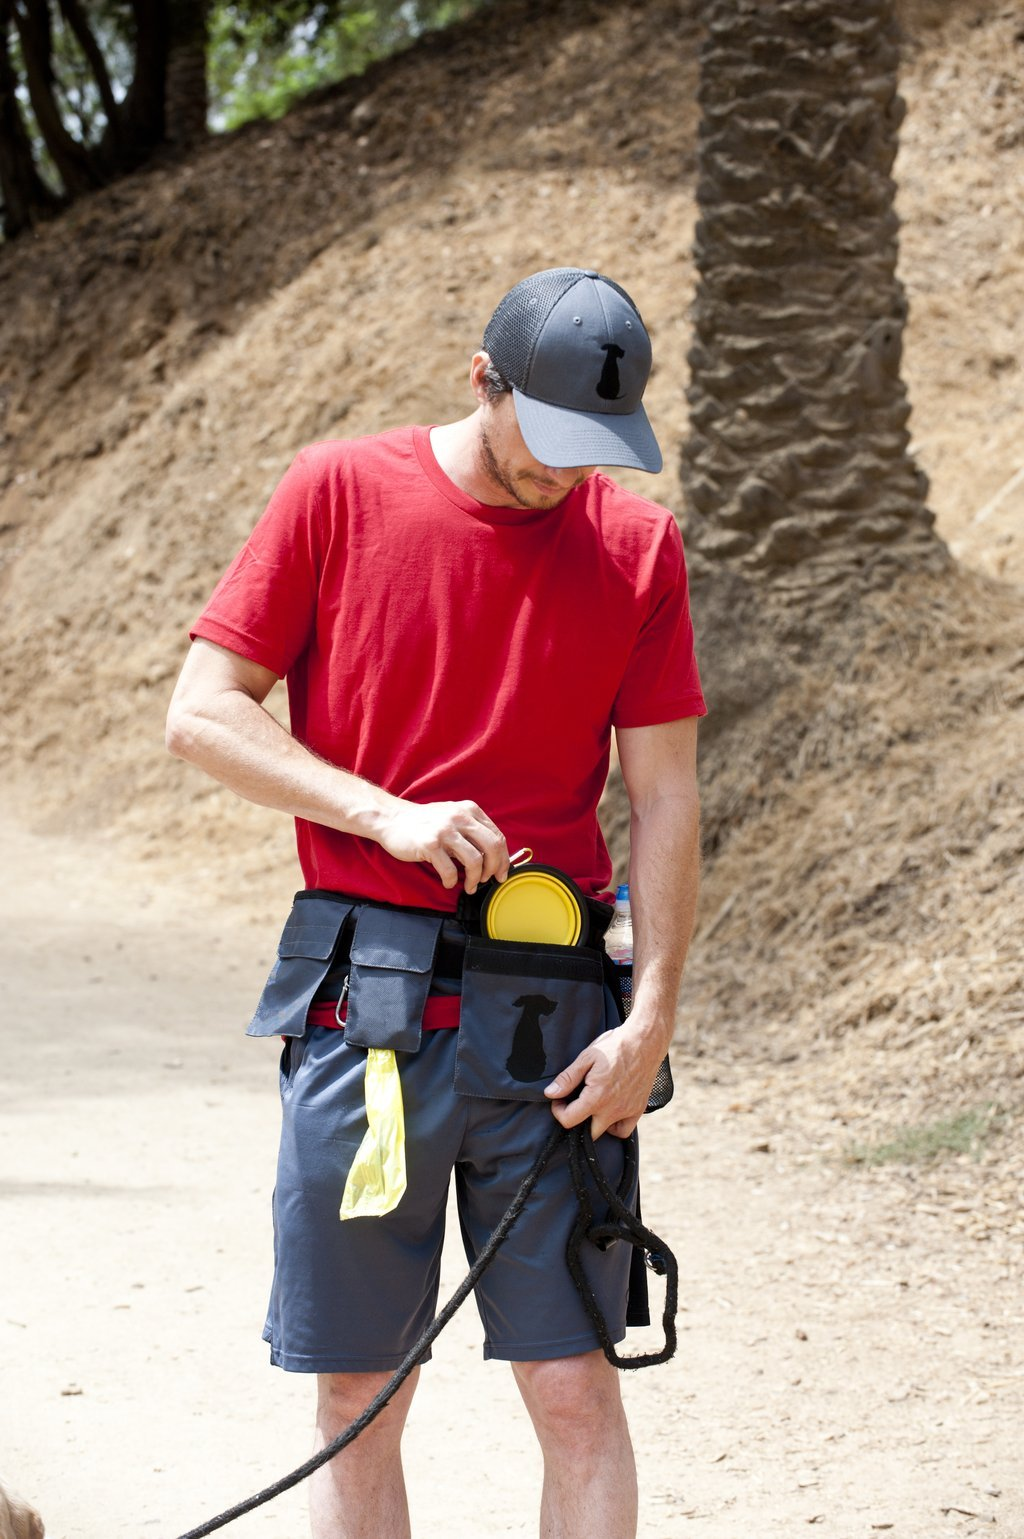 FreshStart DogiPack Hands Free and Organizational Dog Walking Belt (Grey) by FreshStart DogiPack (Image #4)